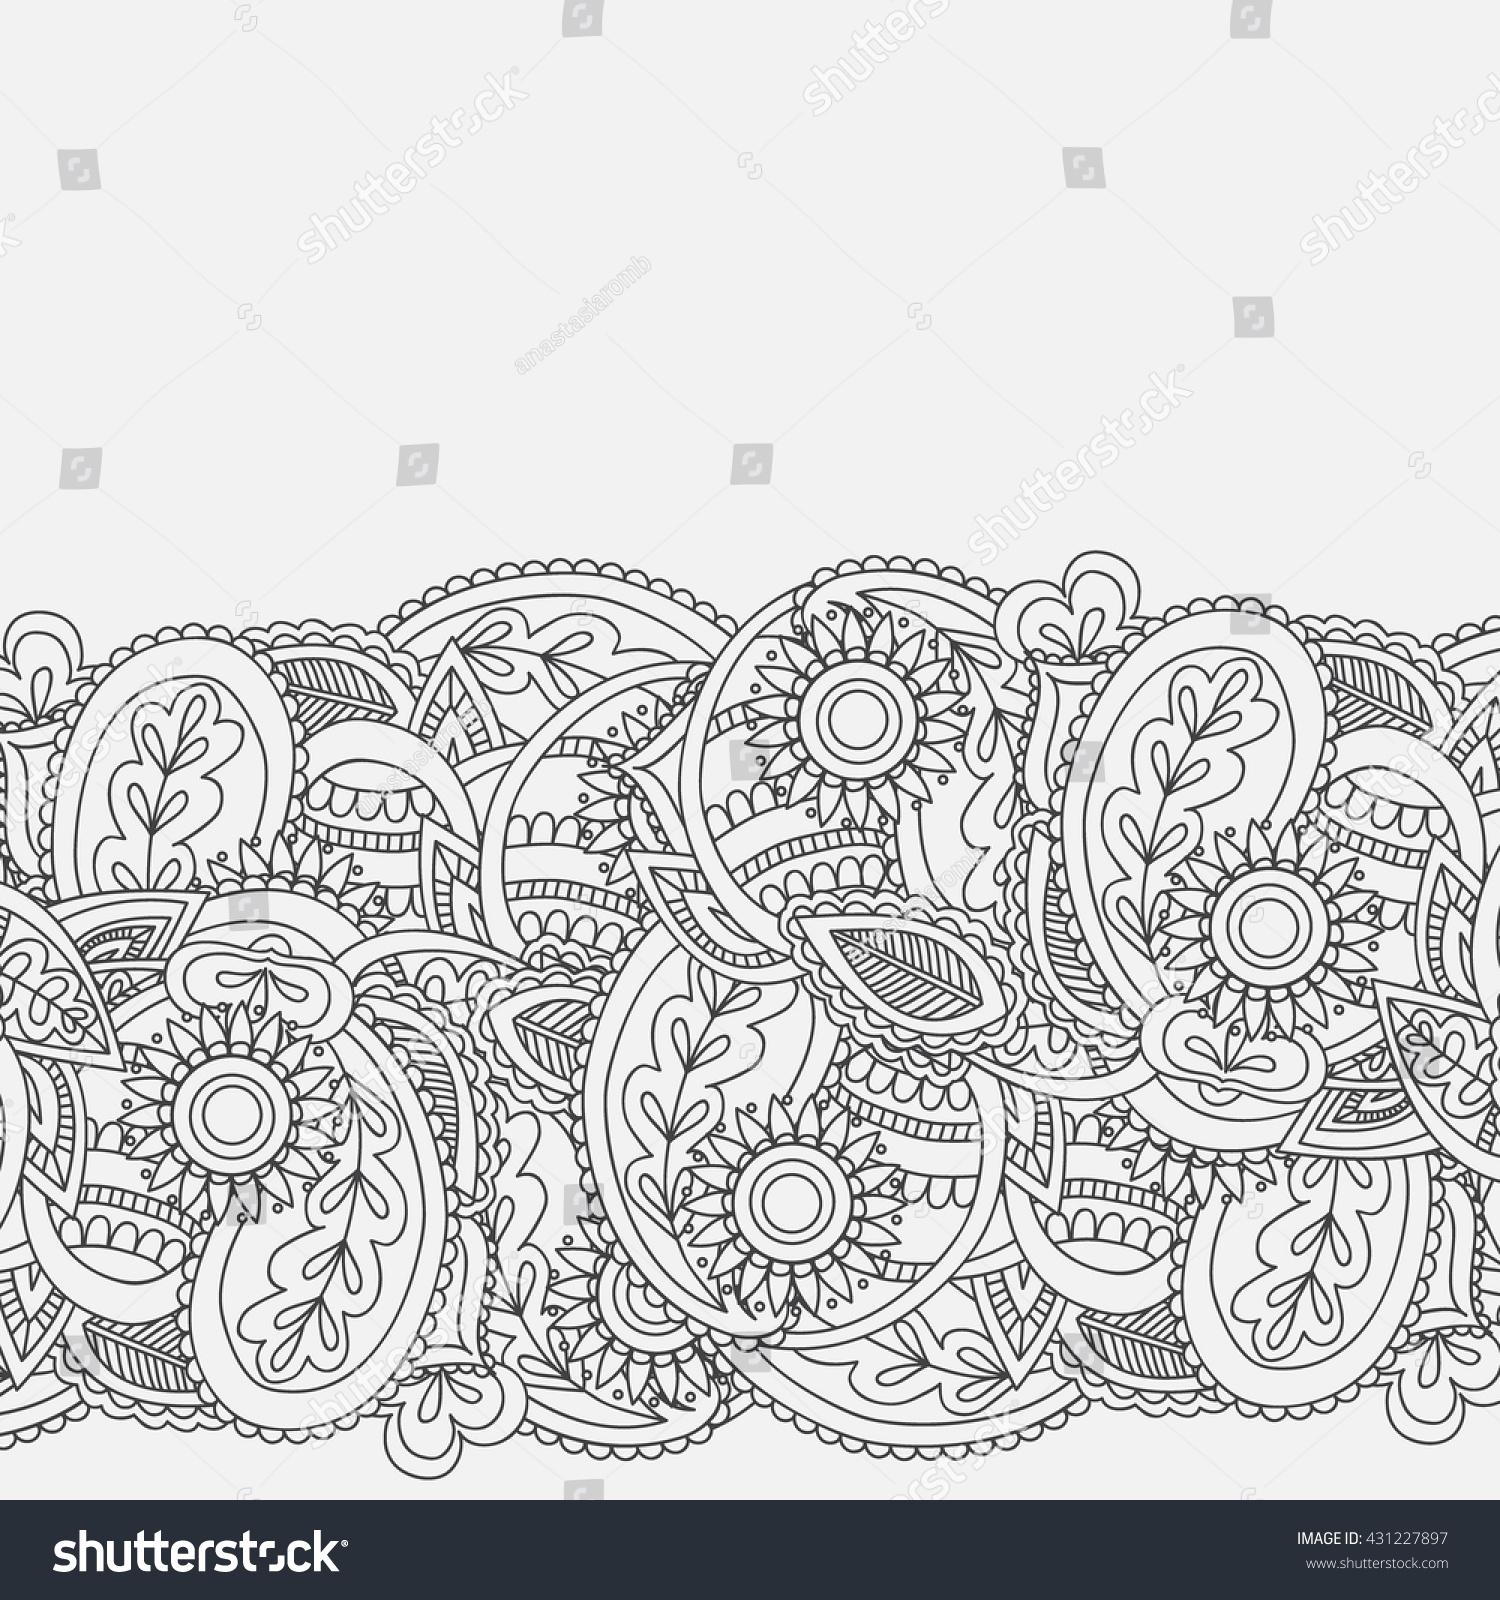 Henna mehndi card template mehndi invitation stock vector henna mehndi card template mehndi invitation design element for decoration invitations and cards stopboris Images